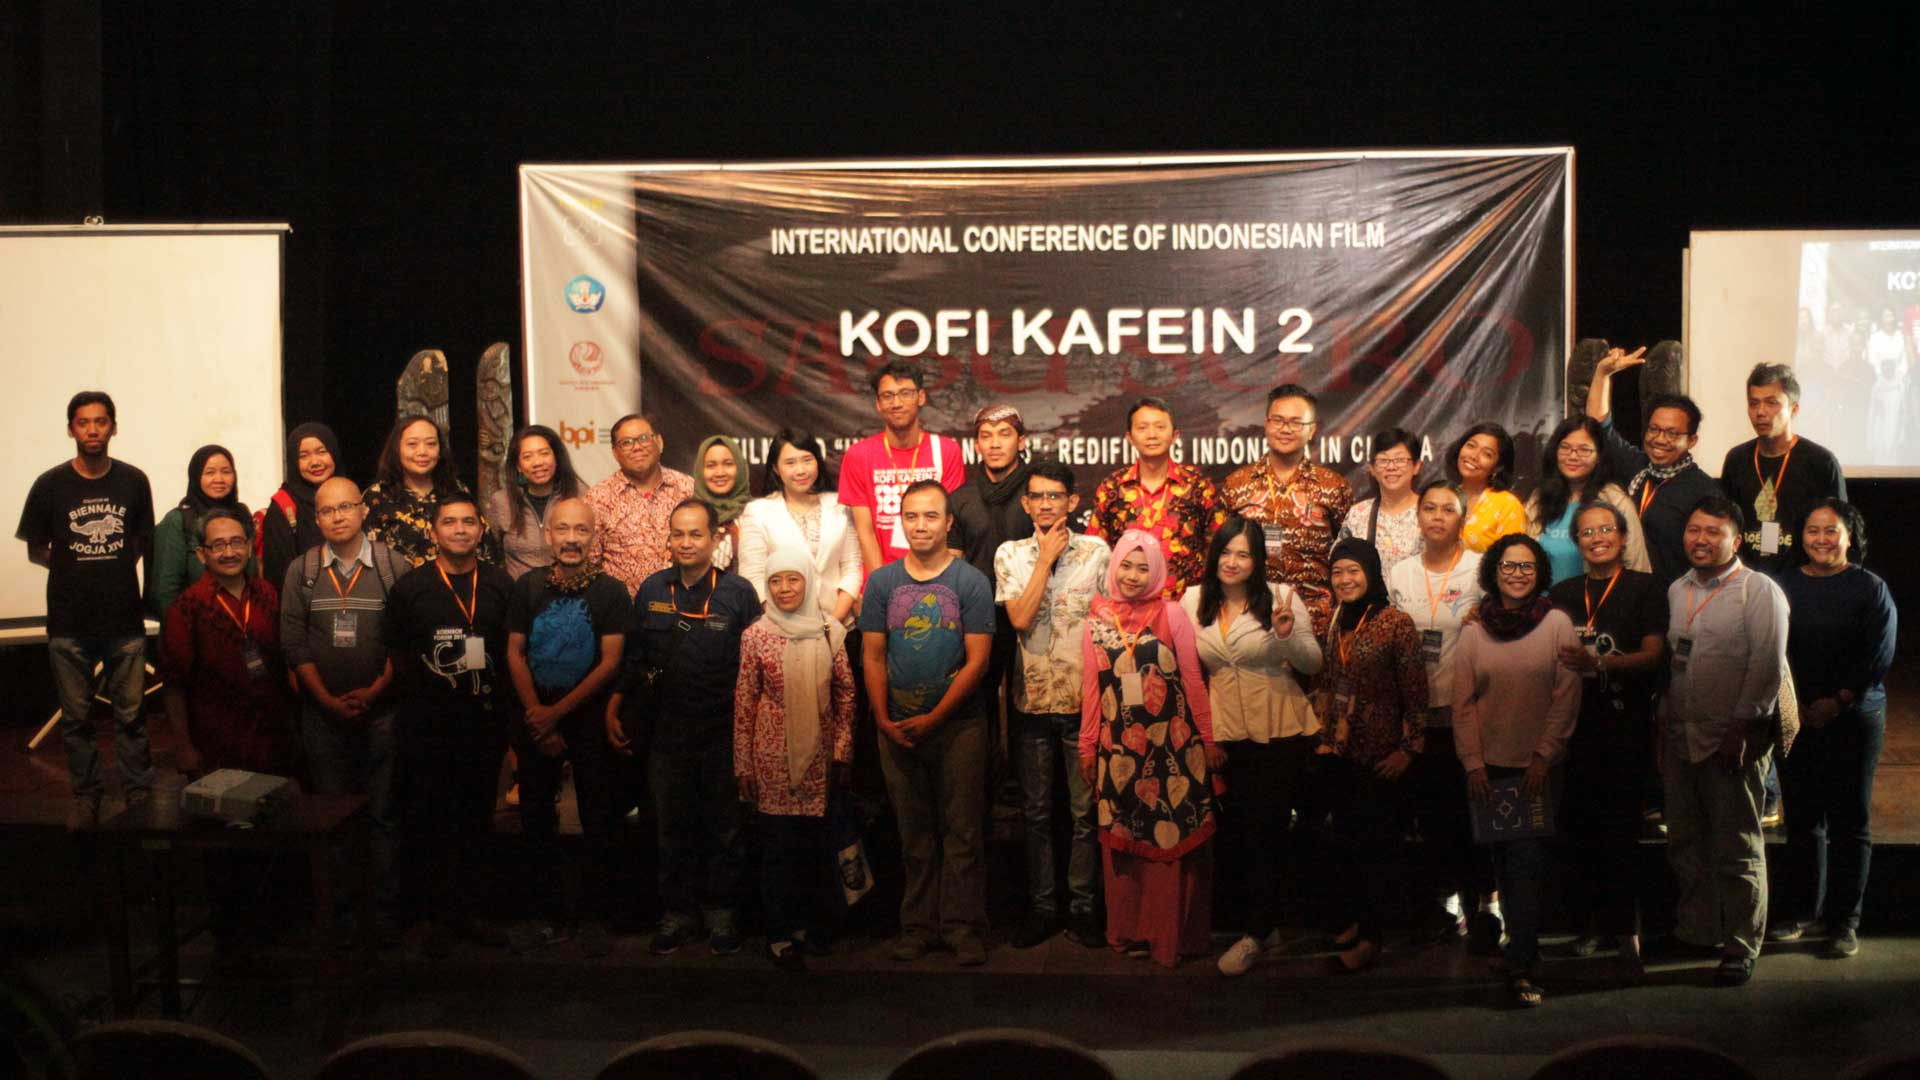 KAFEIN - Asosiasi Pengkaji Film Indonesia